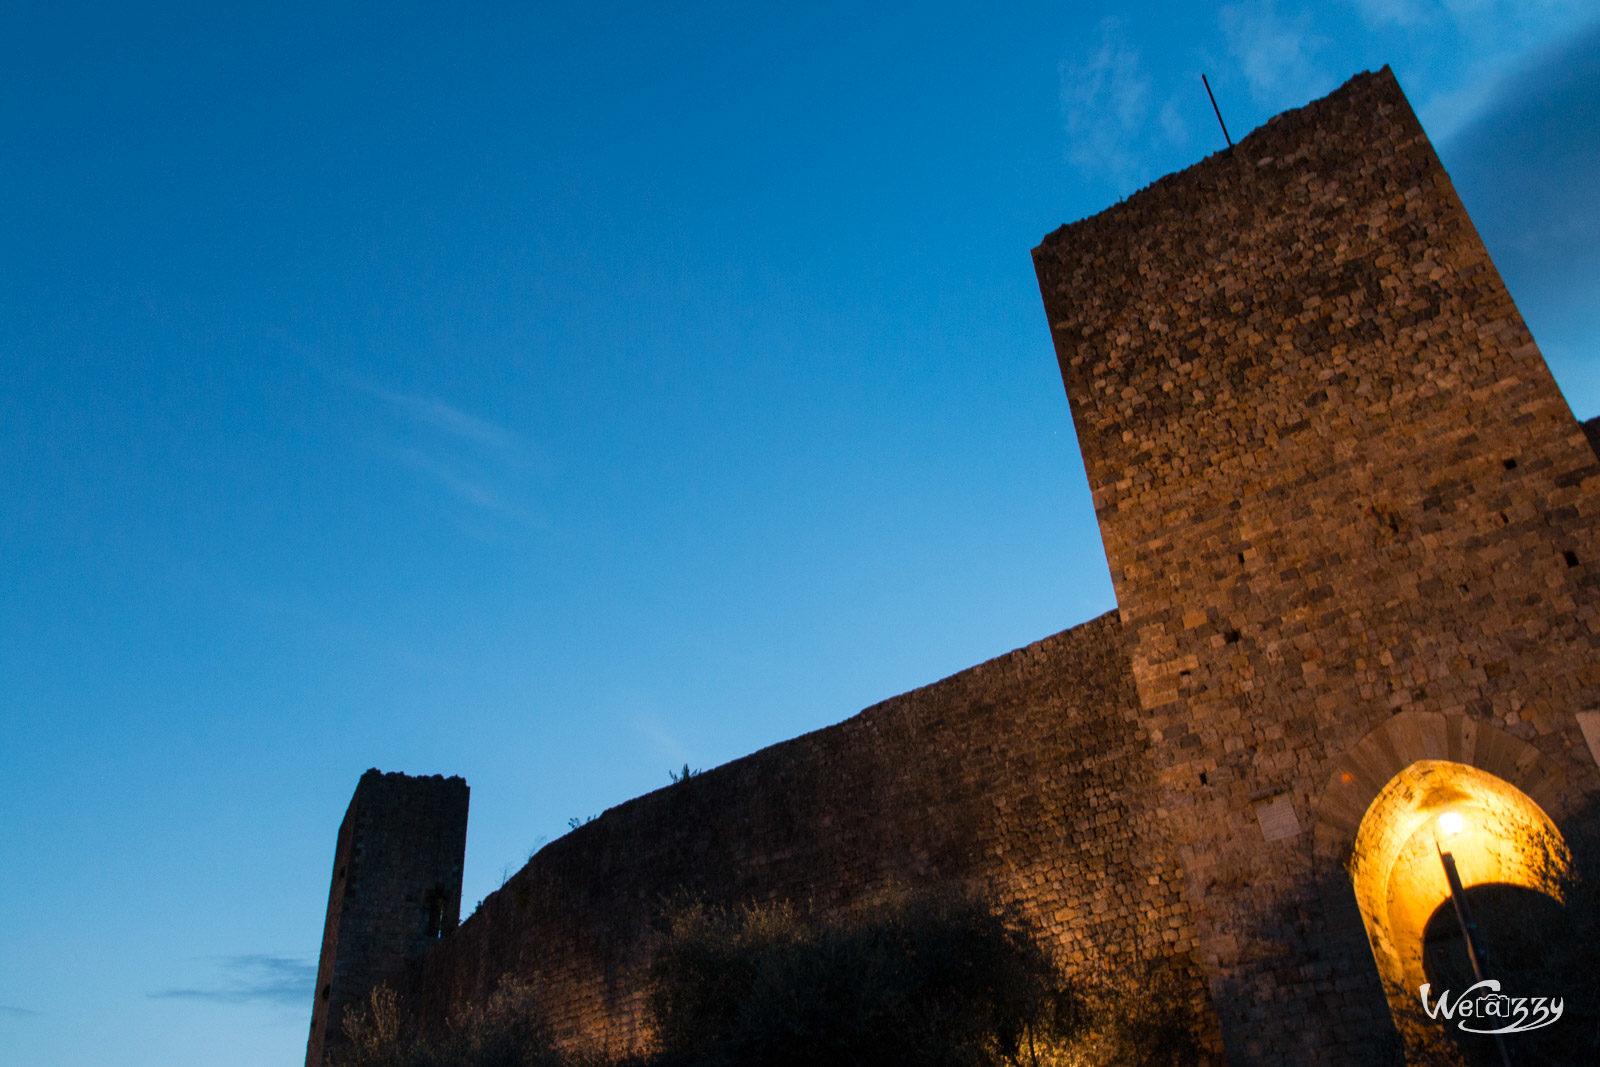 Italie, San Gimigiano & Monteriggioni, Toscane, Voyage